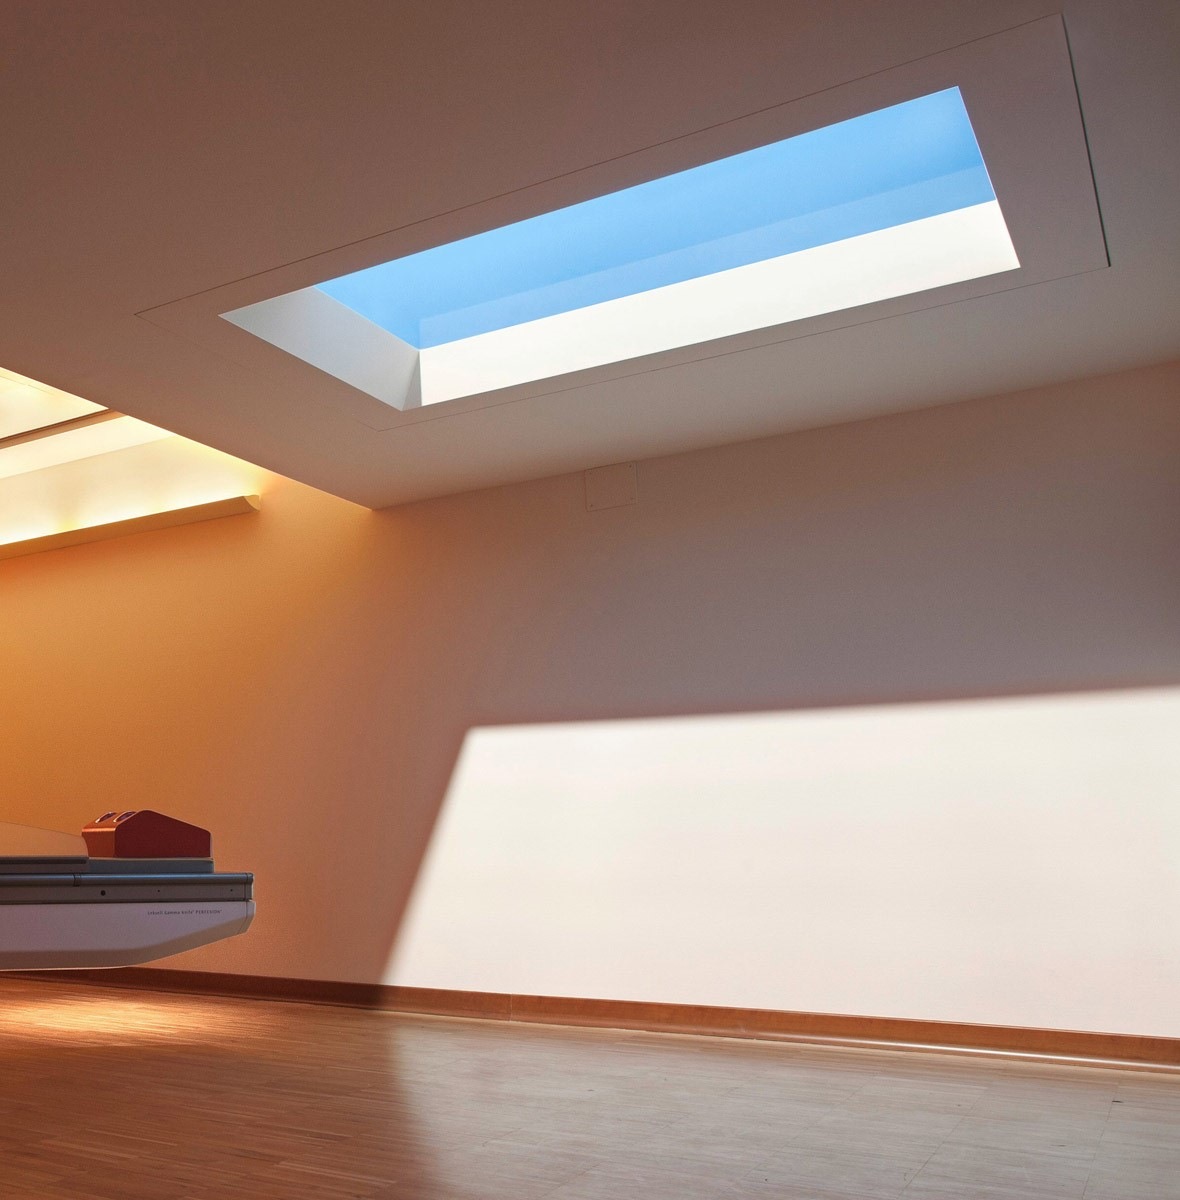 چگونگی روشنایی محیط 3